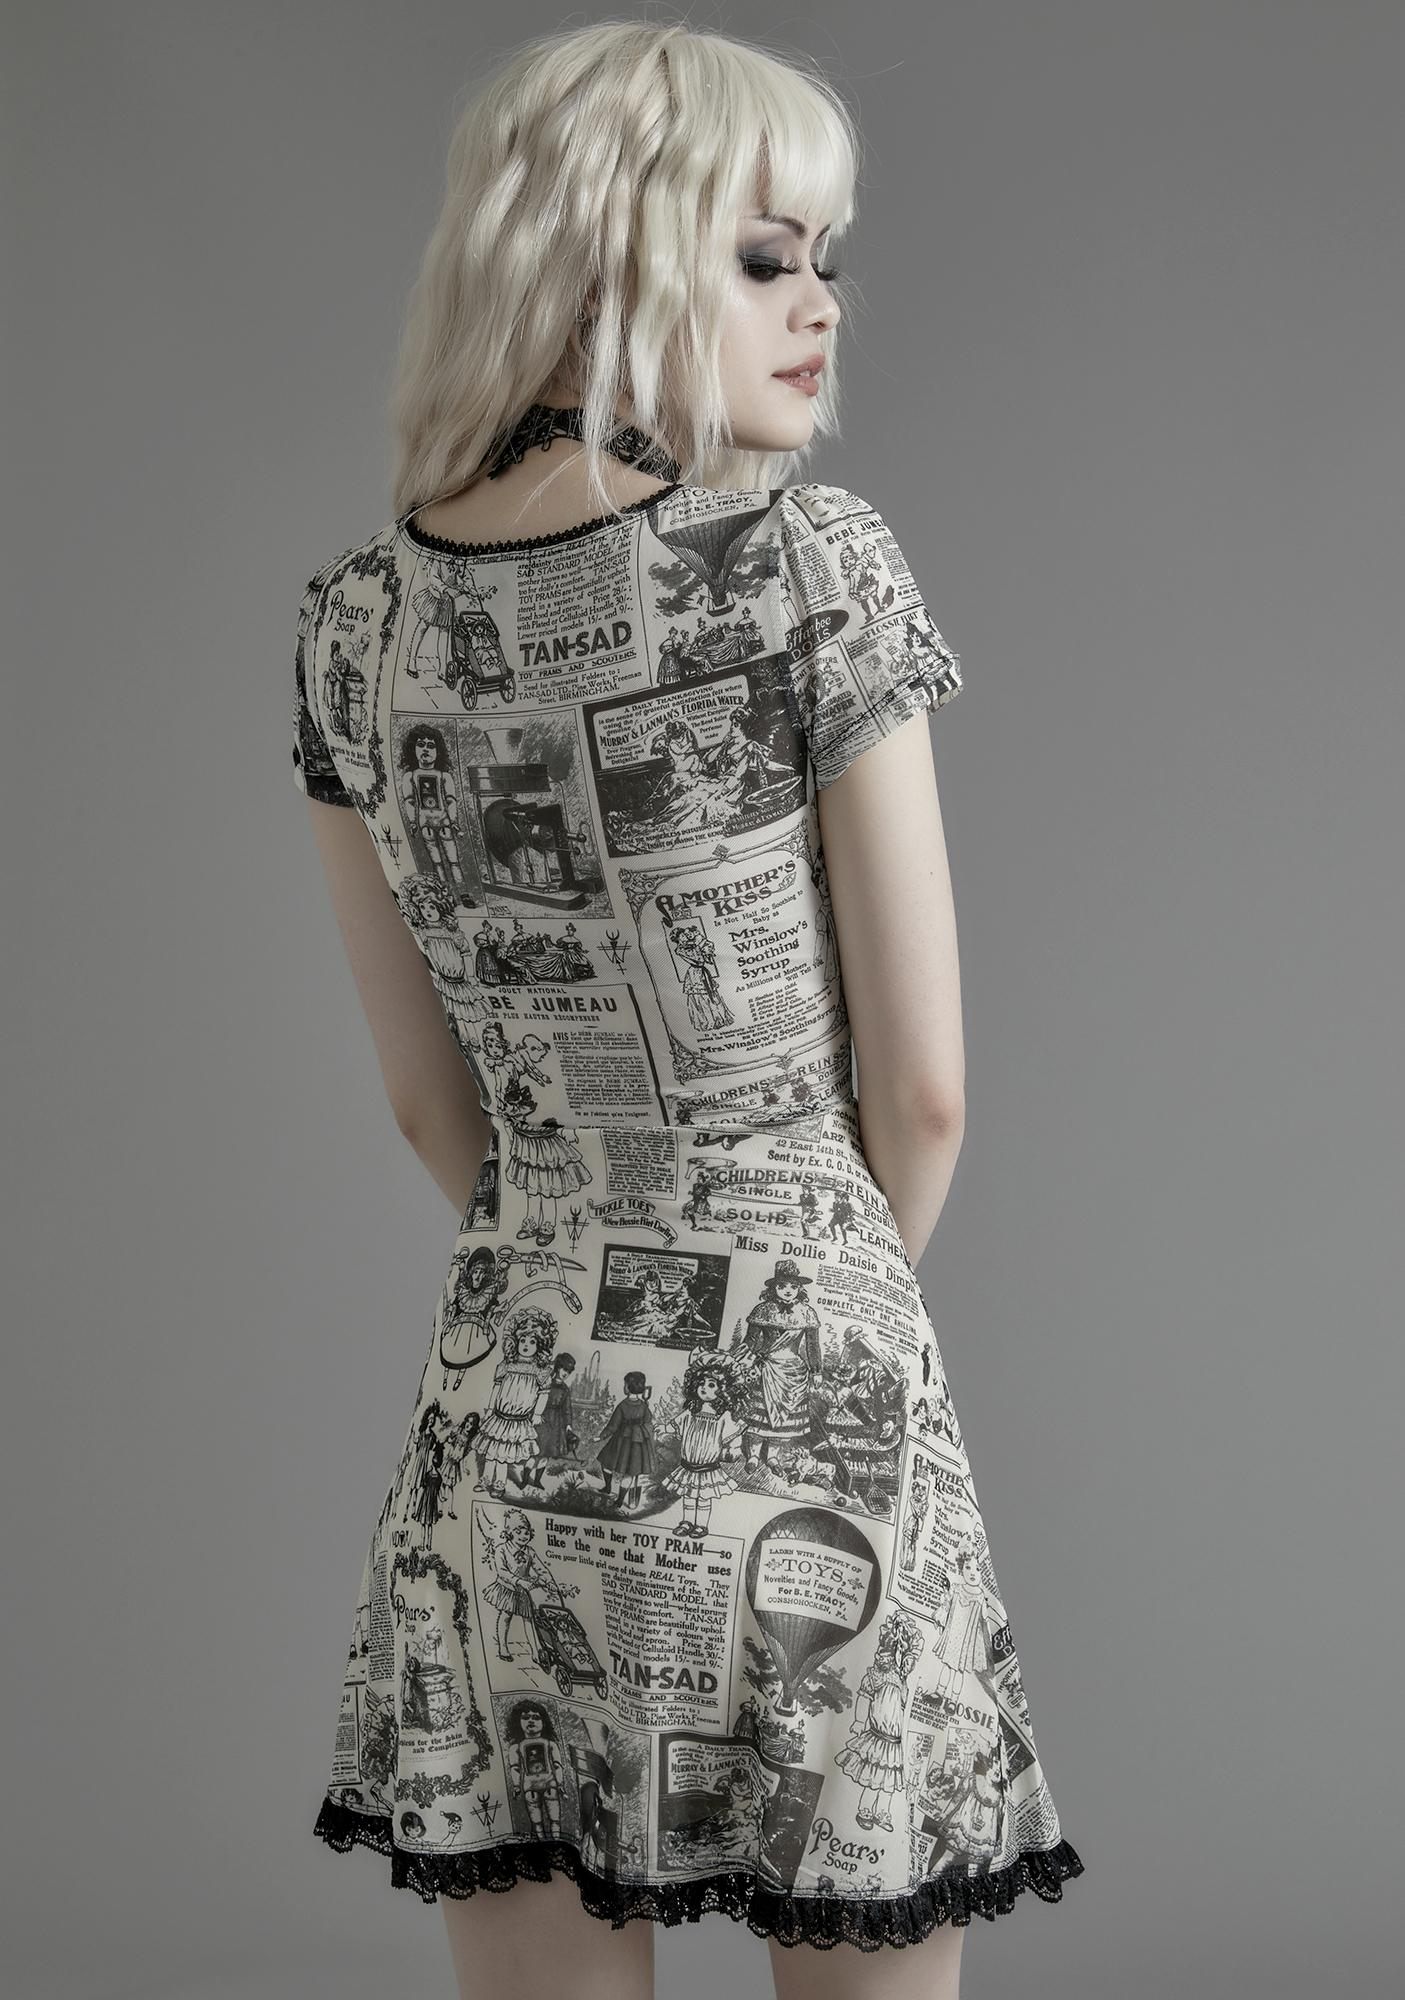 Widow Unfortunate Events Mesh Dress